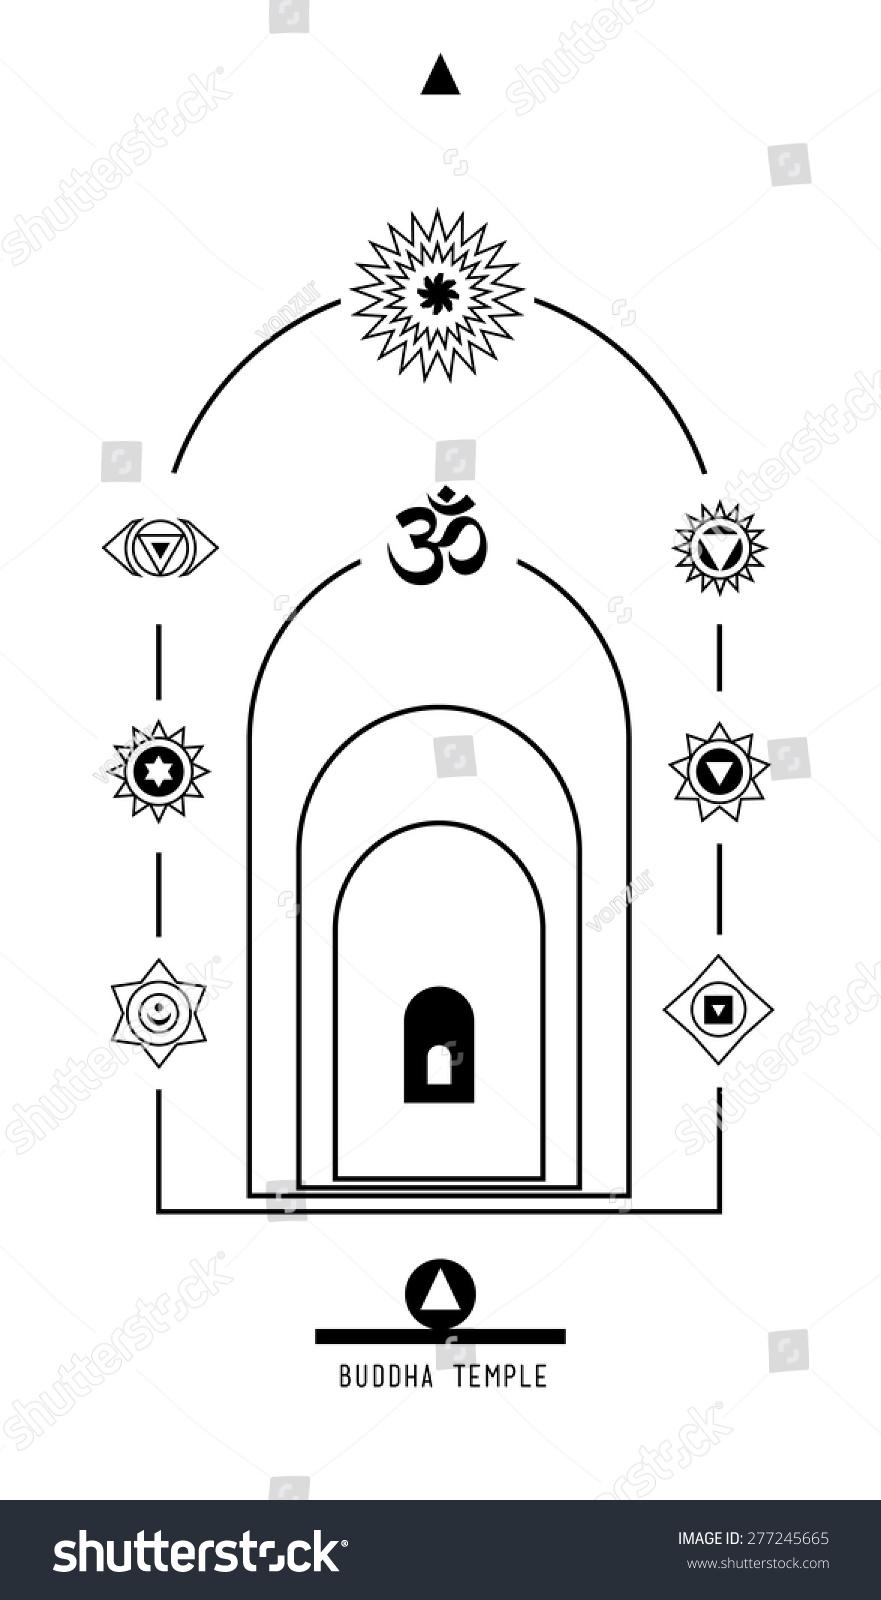 Buddha temple buddhist hindu tantric symbol stock vector 277245665 buddha temple buddhist hindu tantric symbol harmony and balance cosmos and the universe used biocorpaavc Images